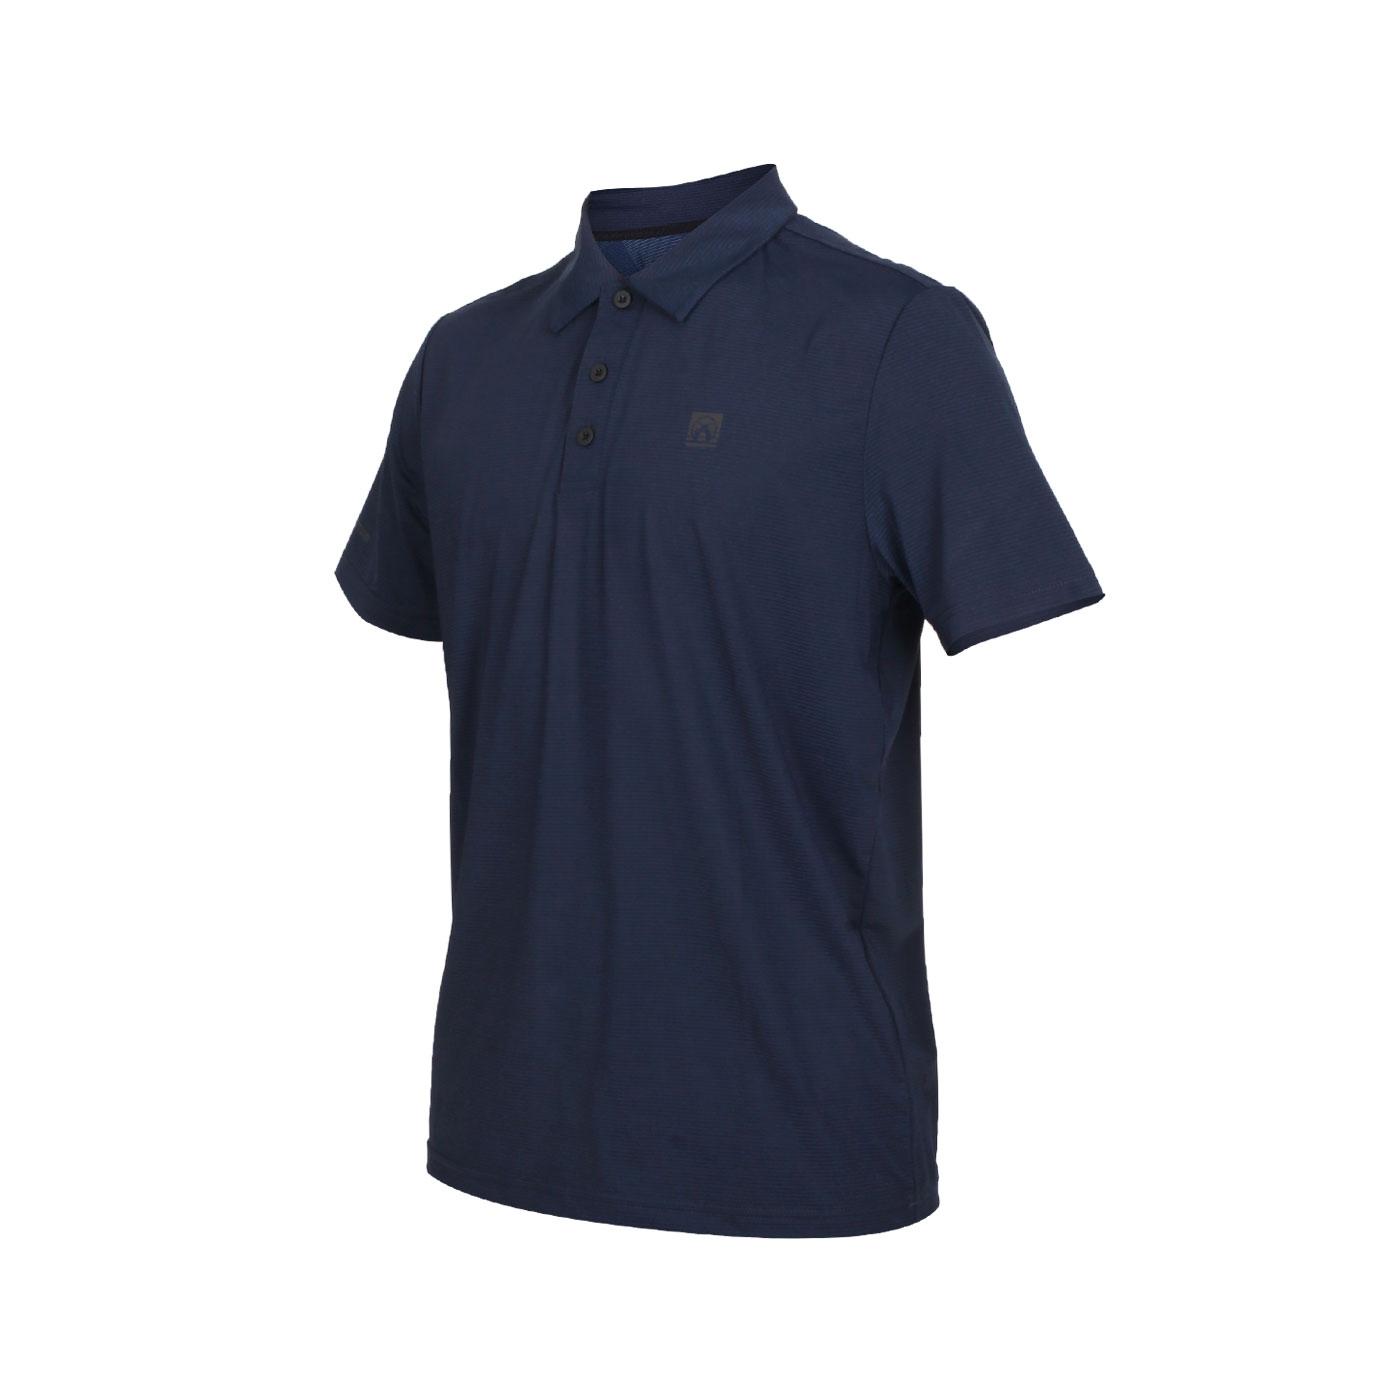 FIRESTAR 男款彈性短袖POLO衫 D0551-18 - 丈青黑